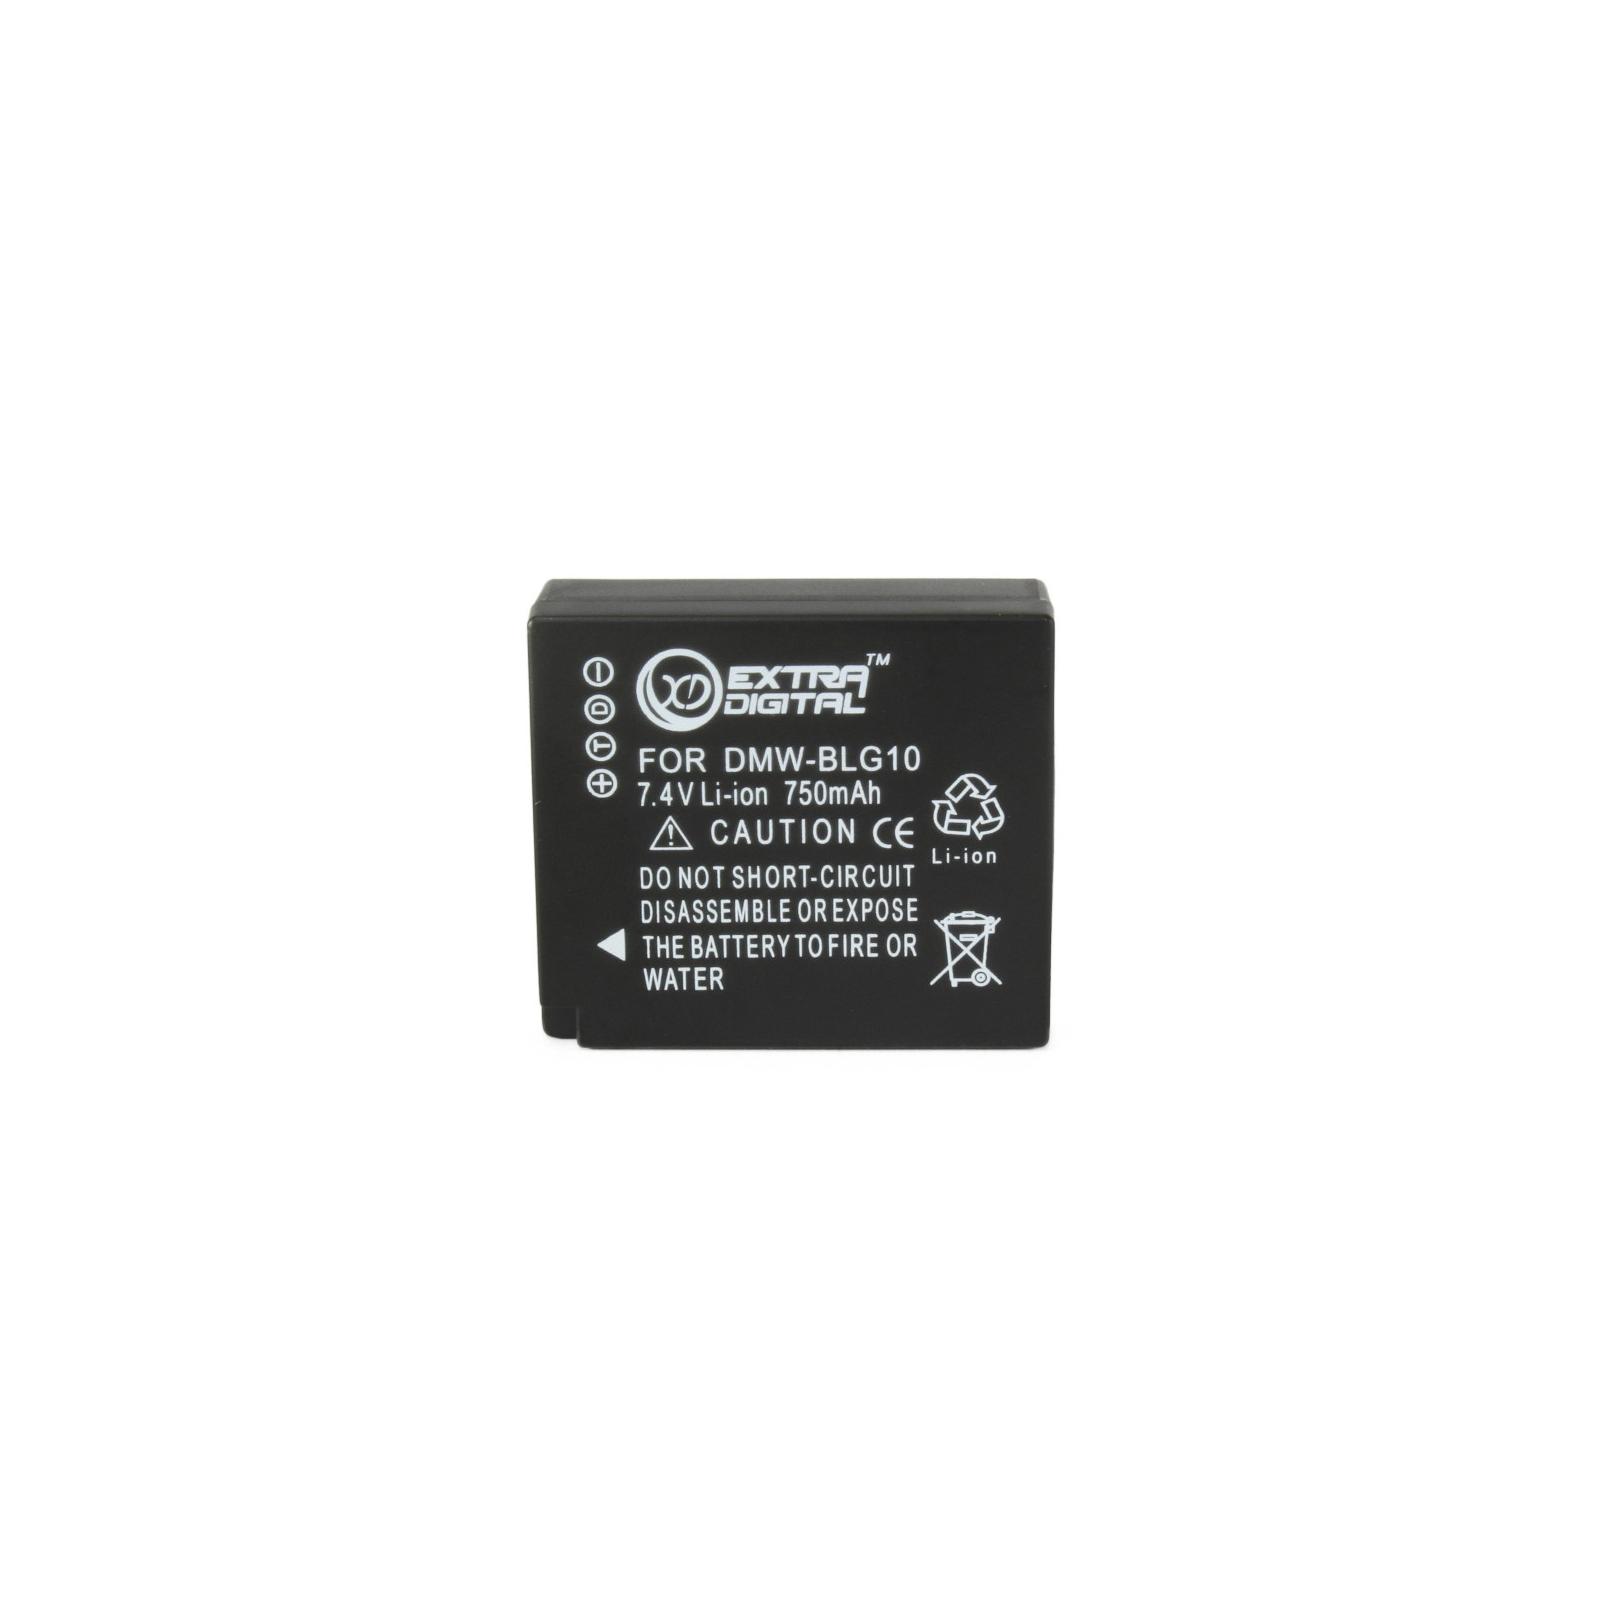 Аккумулятор к фото/видео EXTRADIGITAL Panasonic DMW-BLG10 (BDP1293)